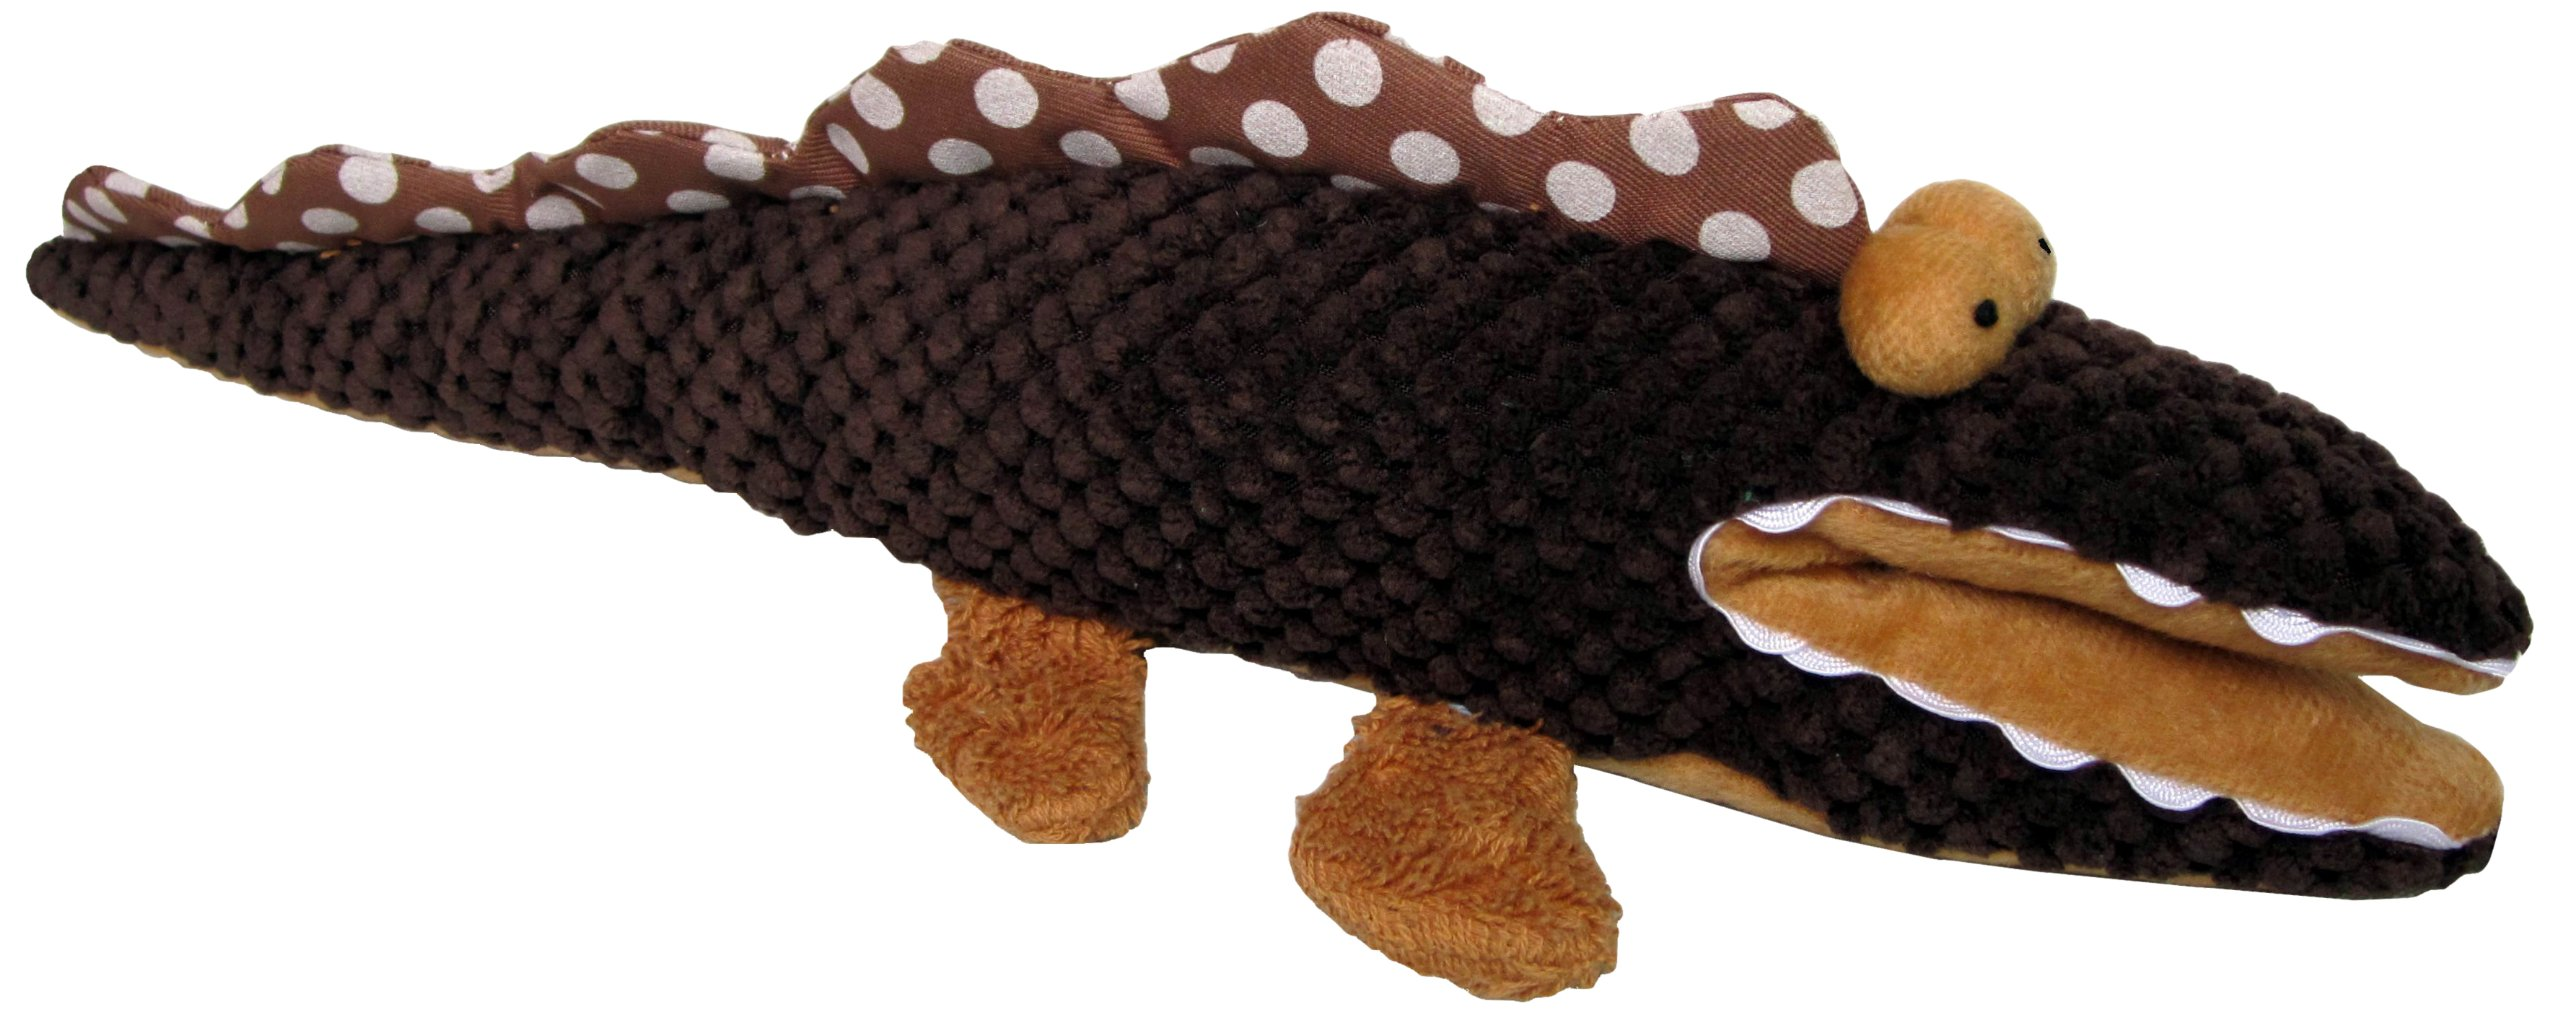 Pet Lou Cute Animal Crocodile Pet Toy, 24-Inch